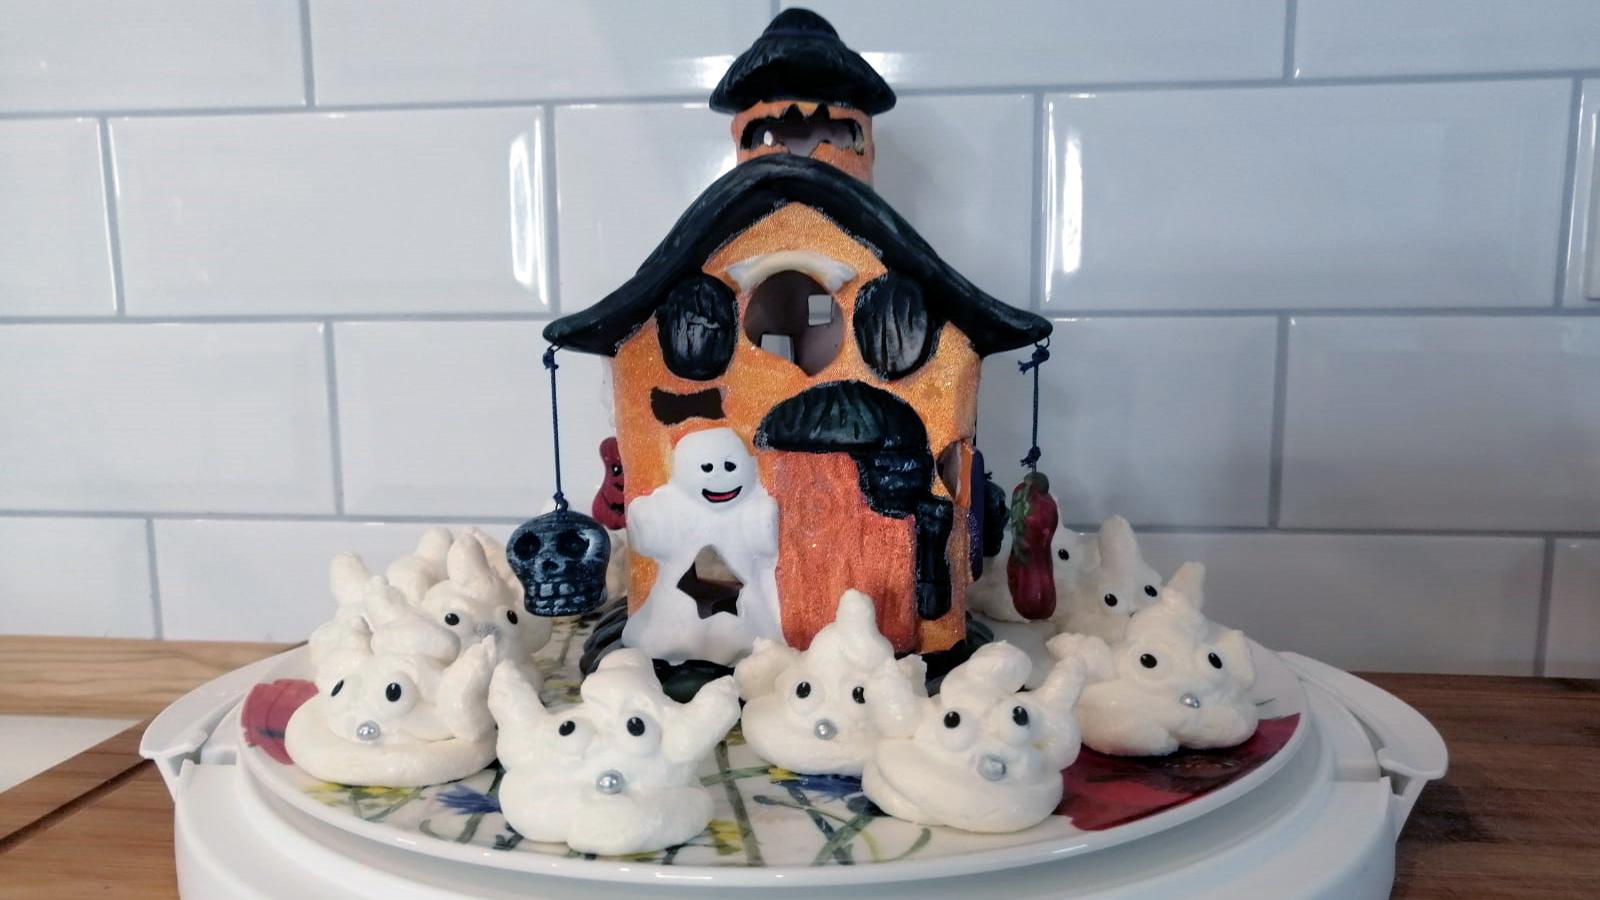 Baiser Geister Rezept für Halloween Geister